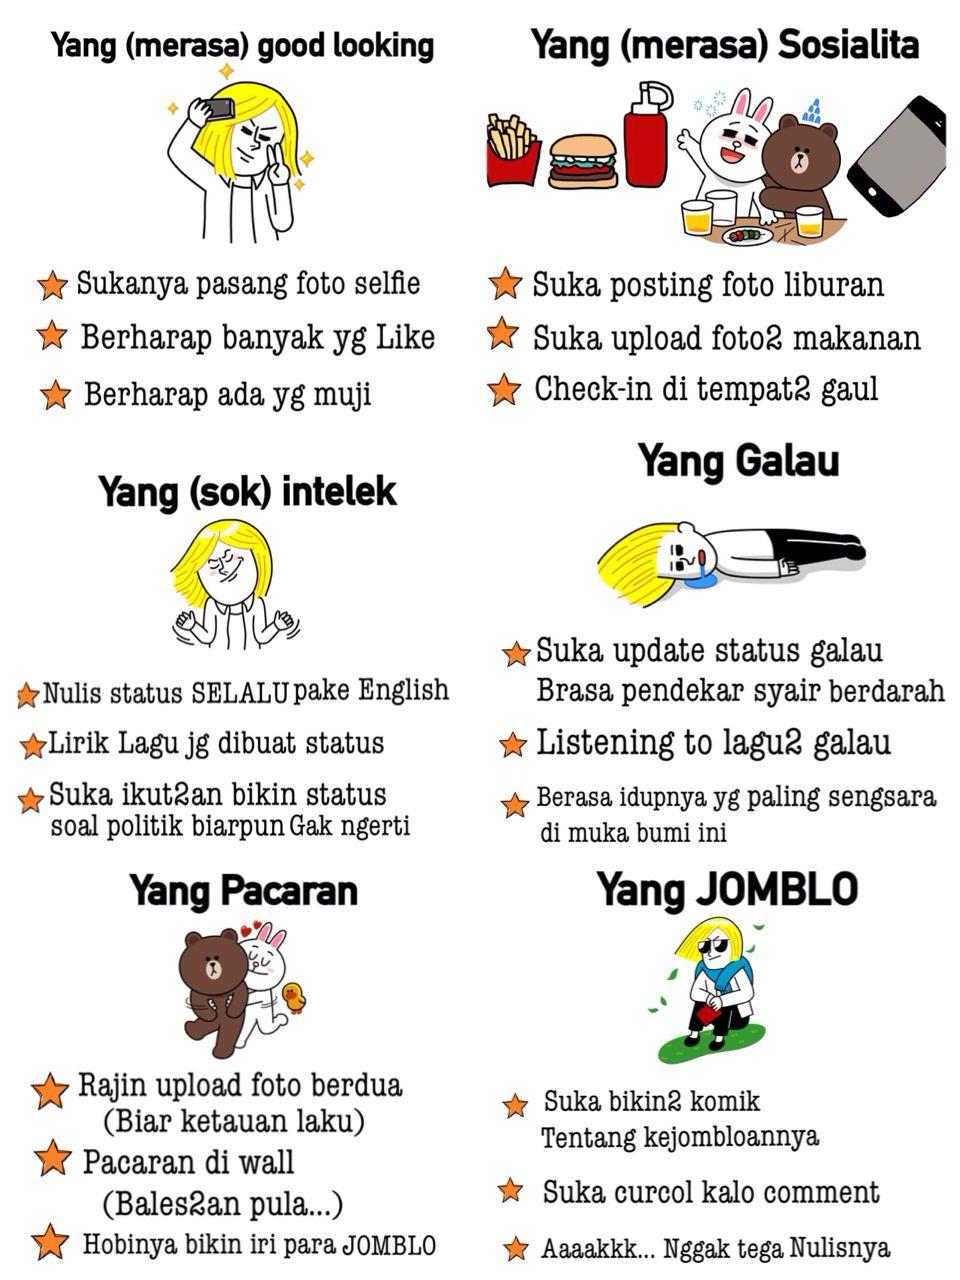 Sosialita indonesia